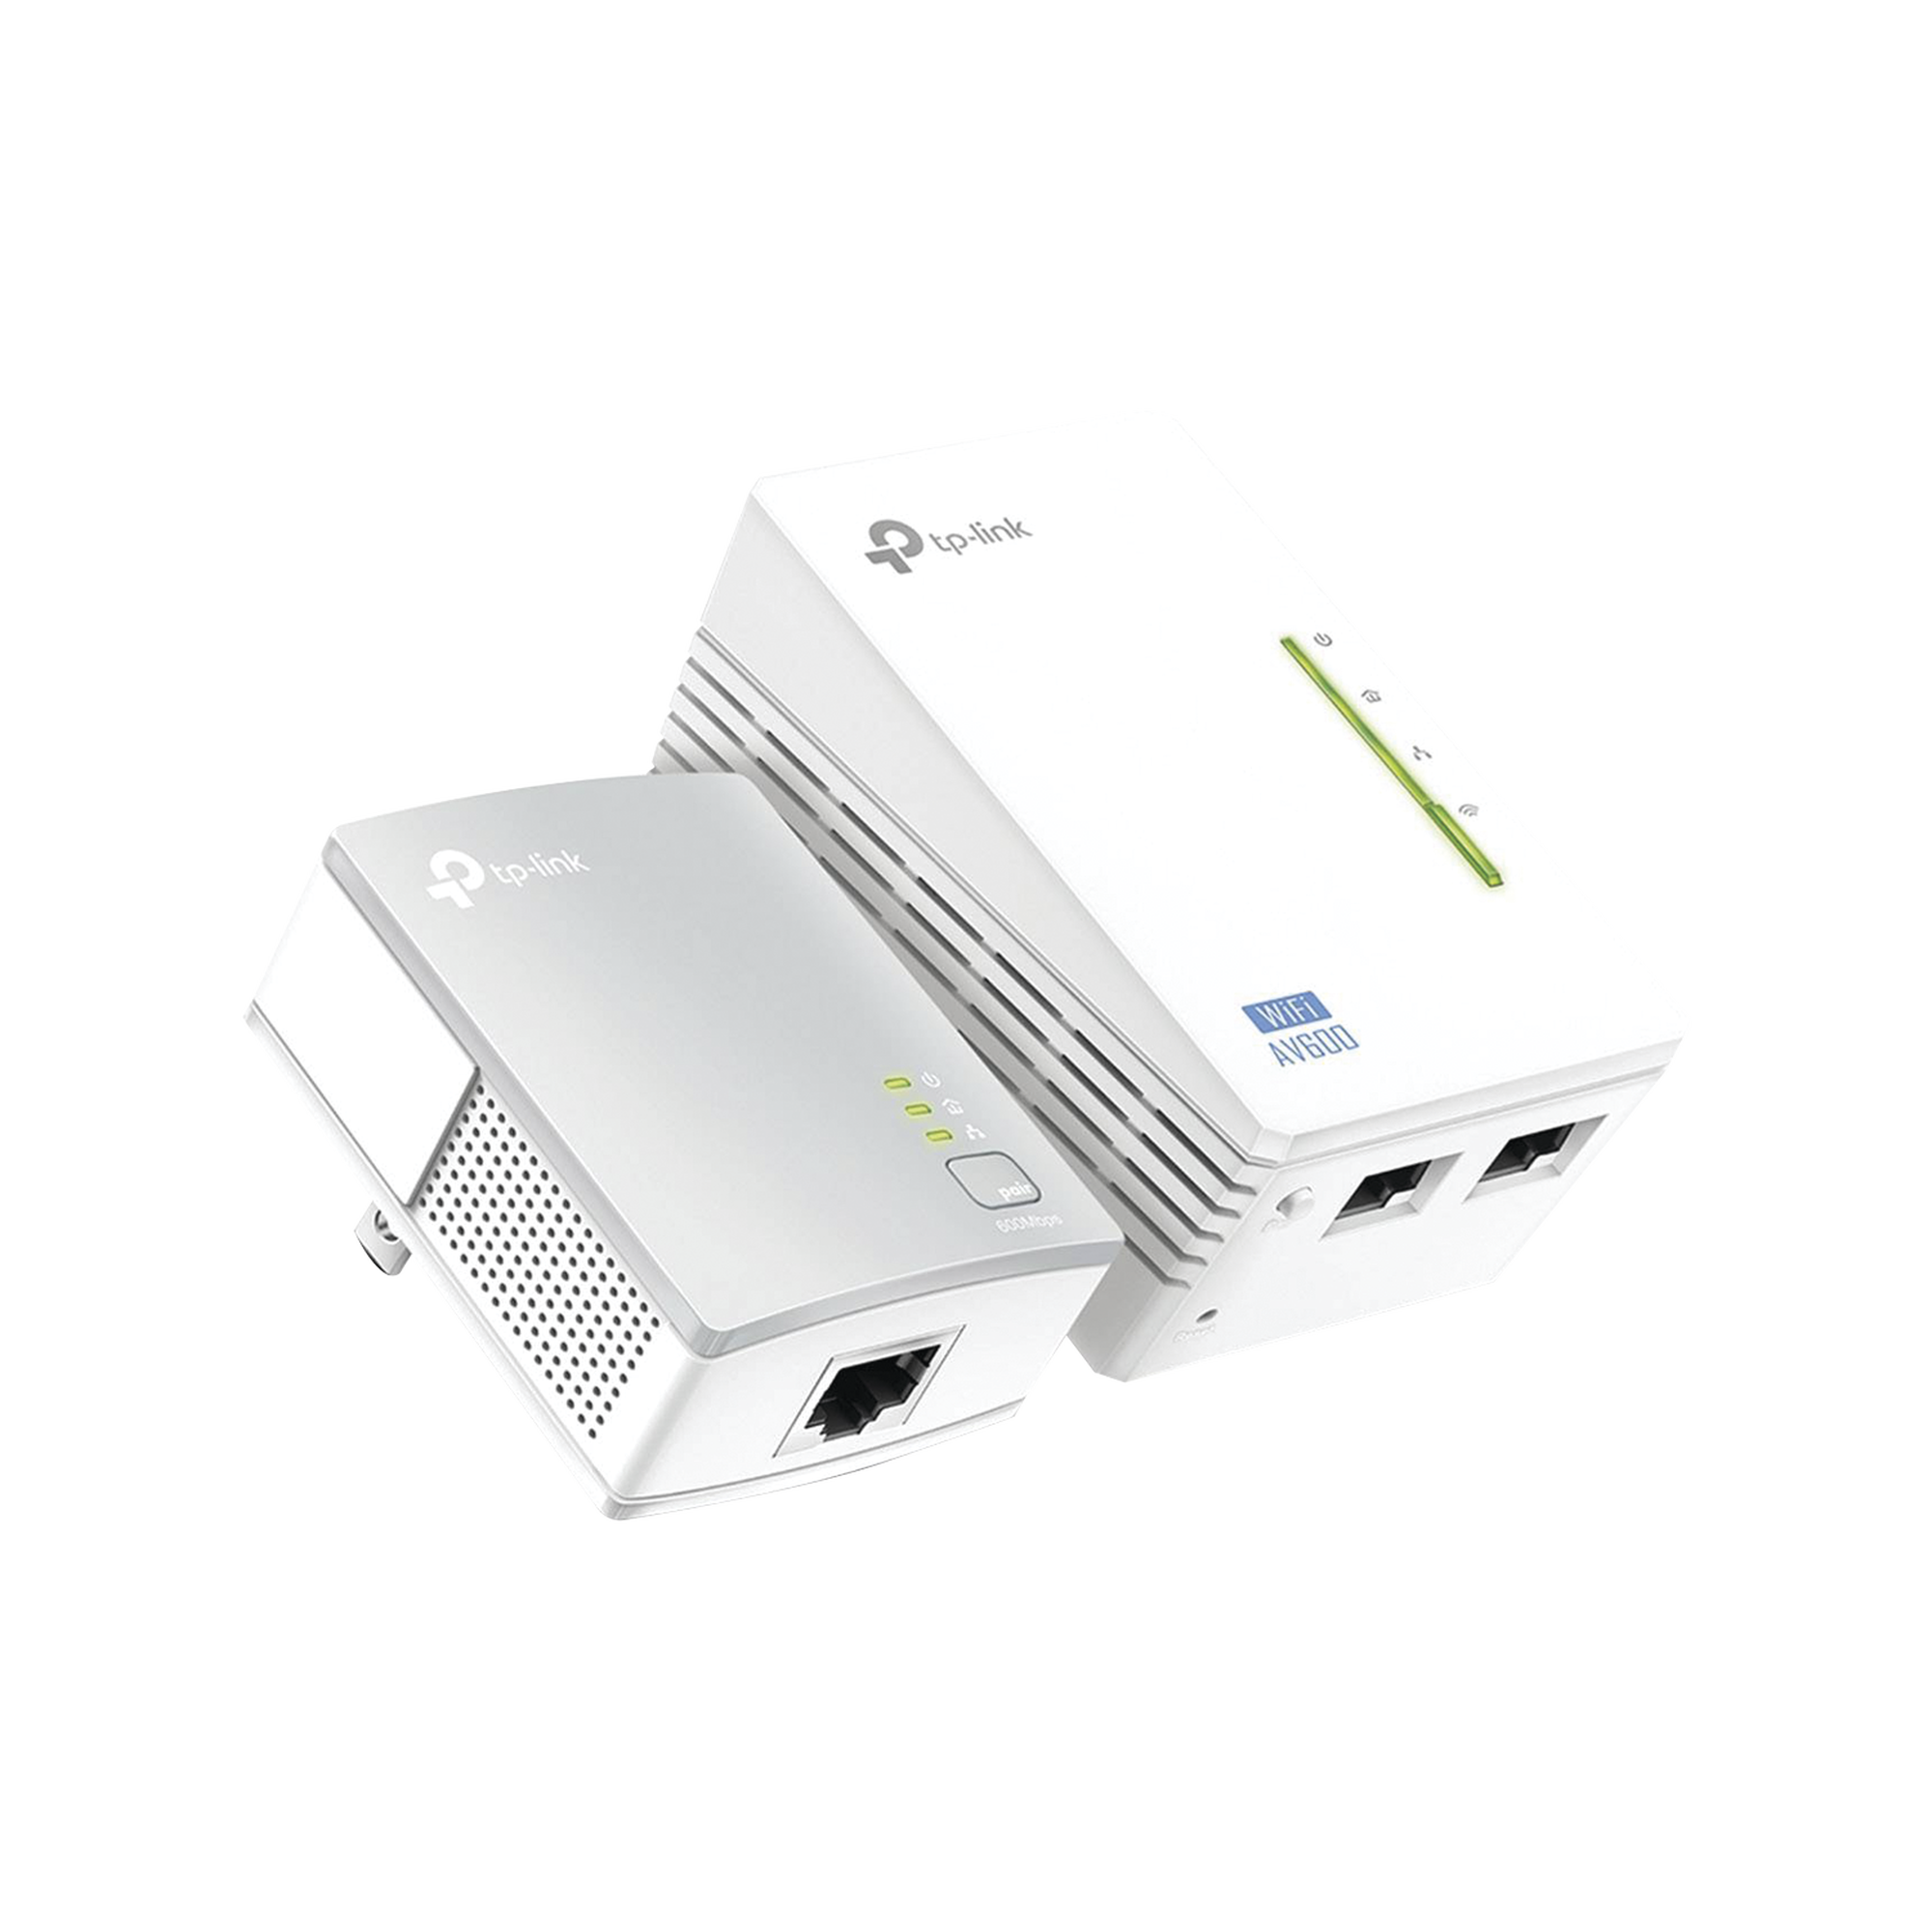 Kit Adaptador PowerLine Inalambrico 300Mbps, 2 Puertos 10/100 Mbps, HomePlug AV, Plug and Play, WiFi Clon.